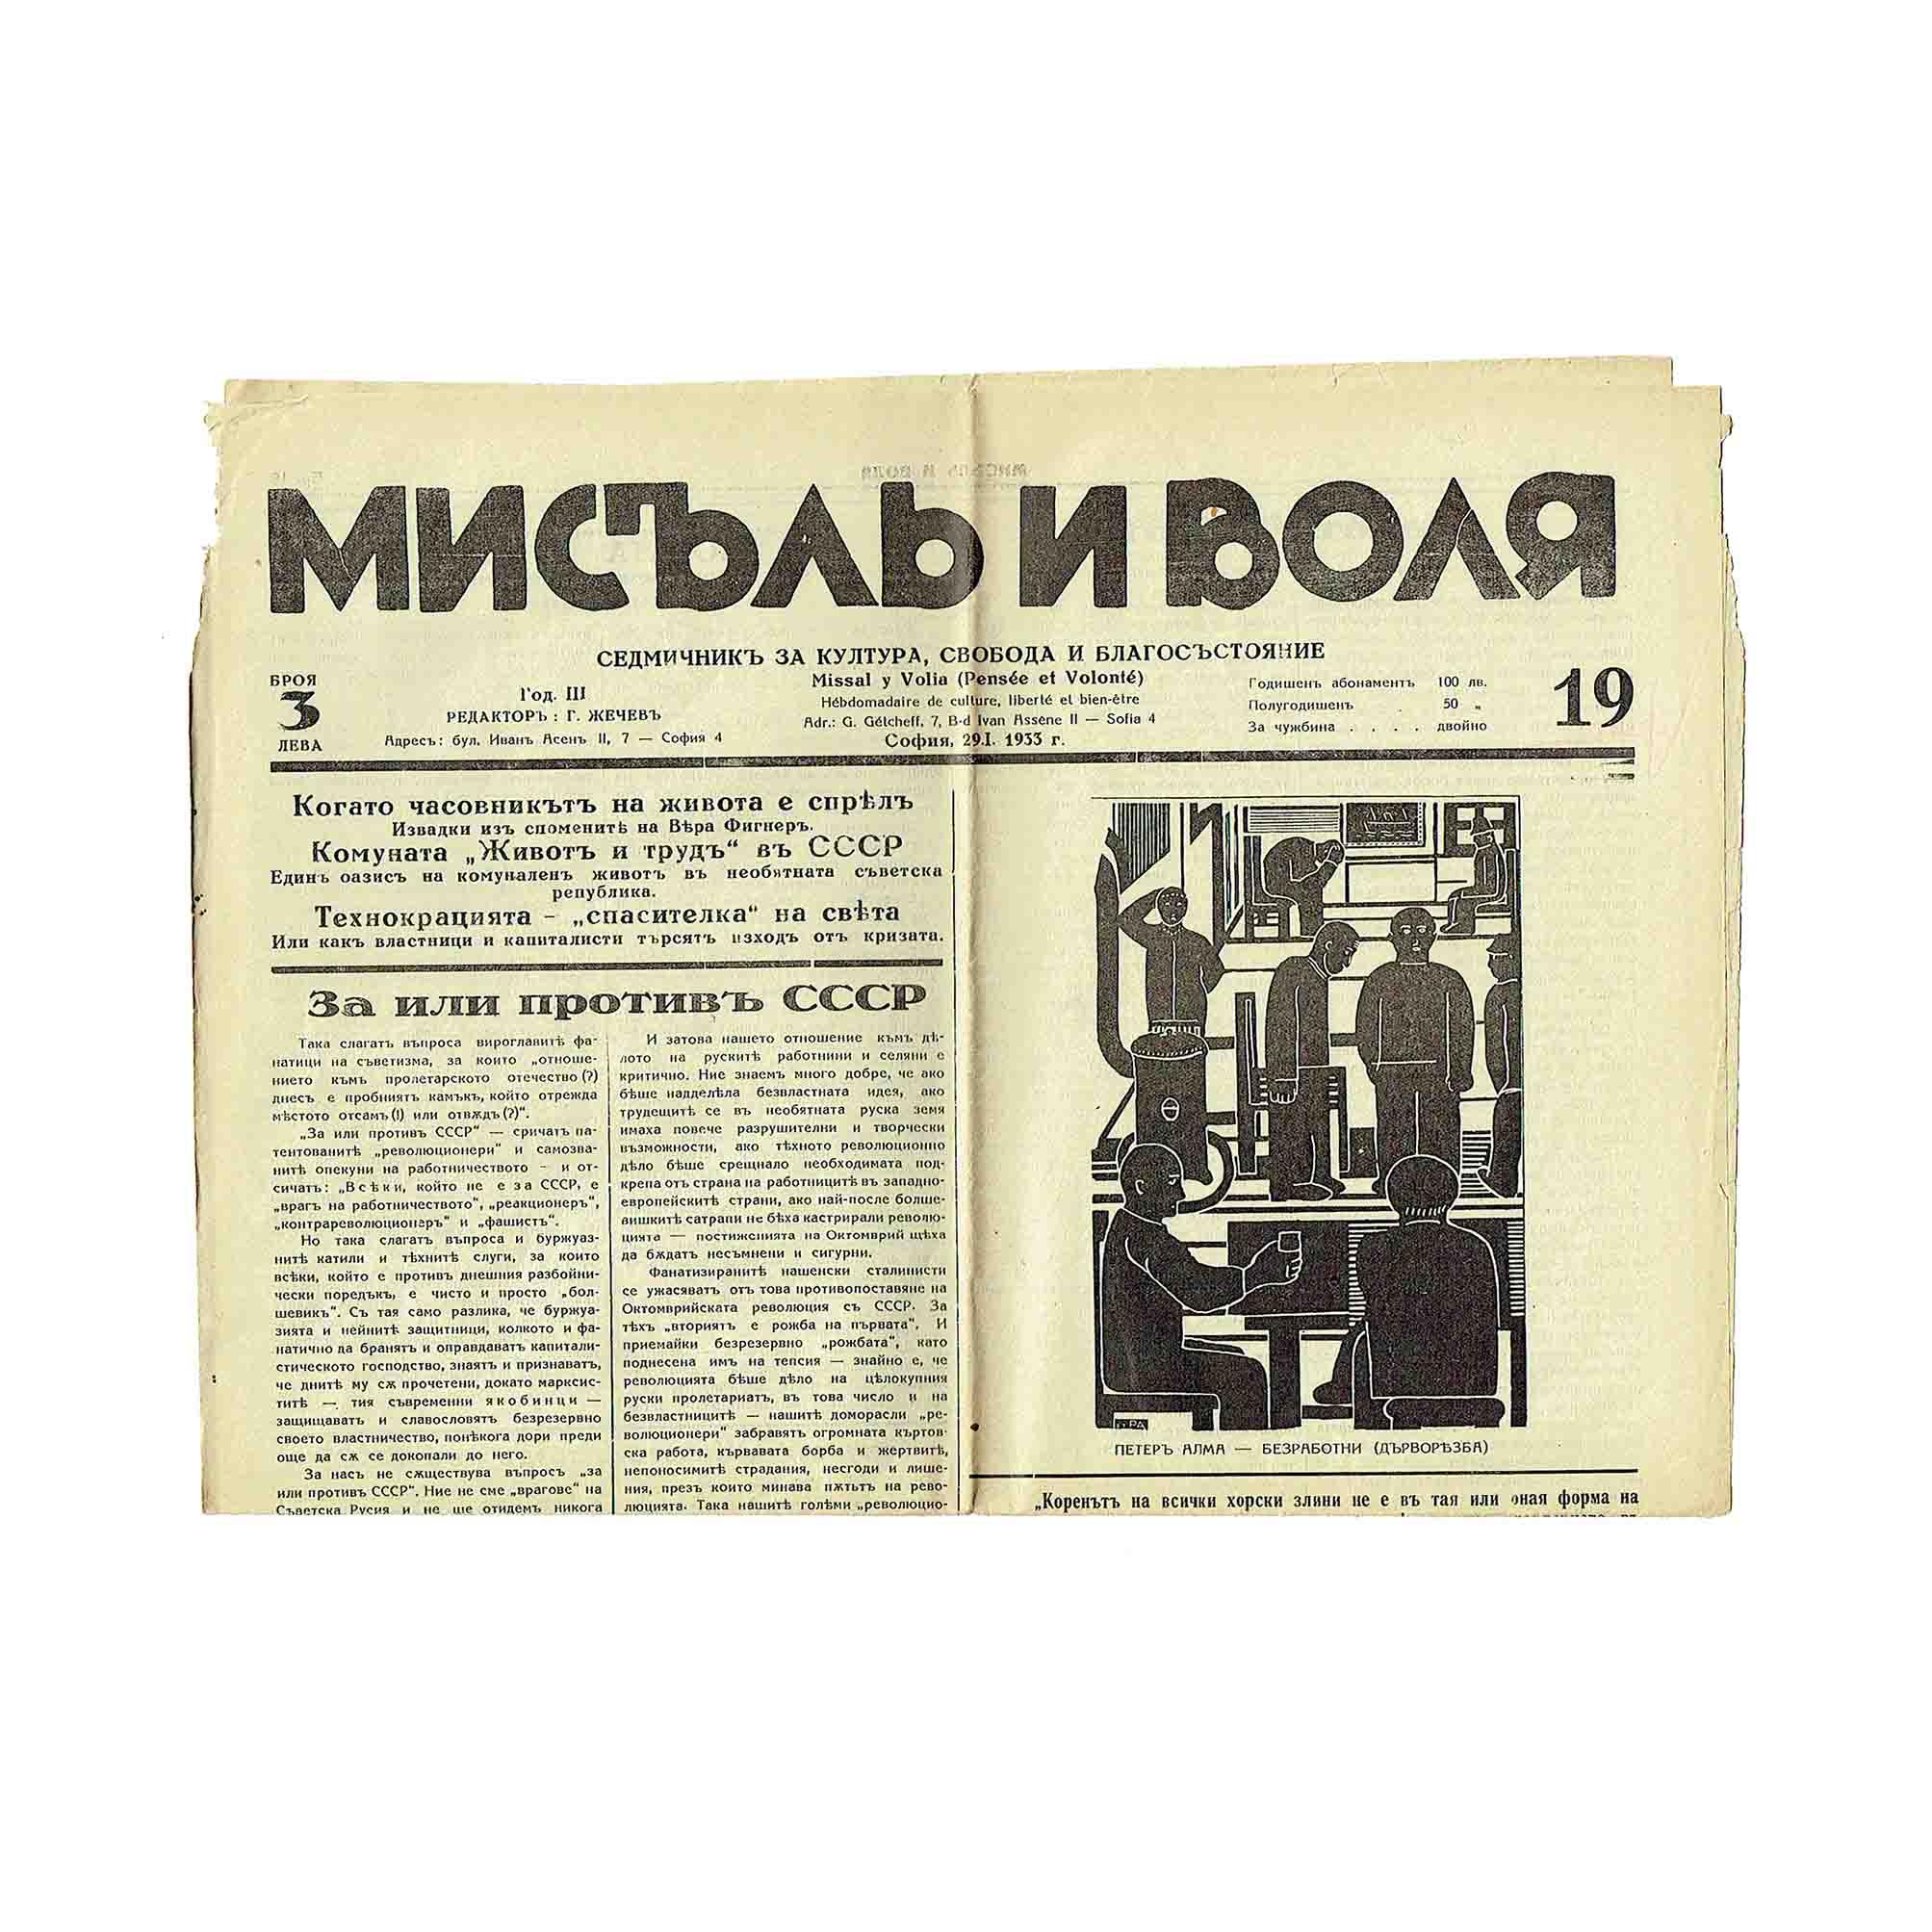 5847-Misal-i-Volya-Gedanke-und-Wille-III-19-1930-Peter-Alma-Titelblatt-frei-N.jpeg